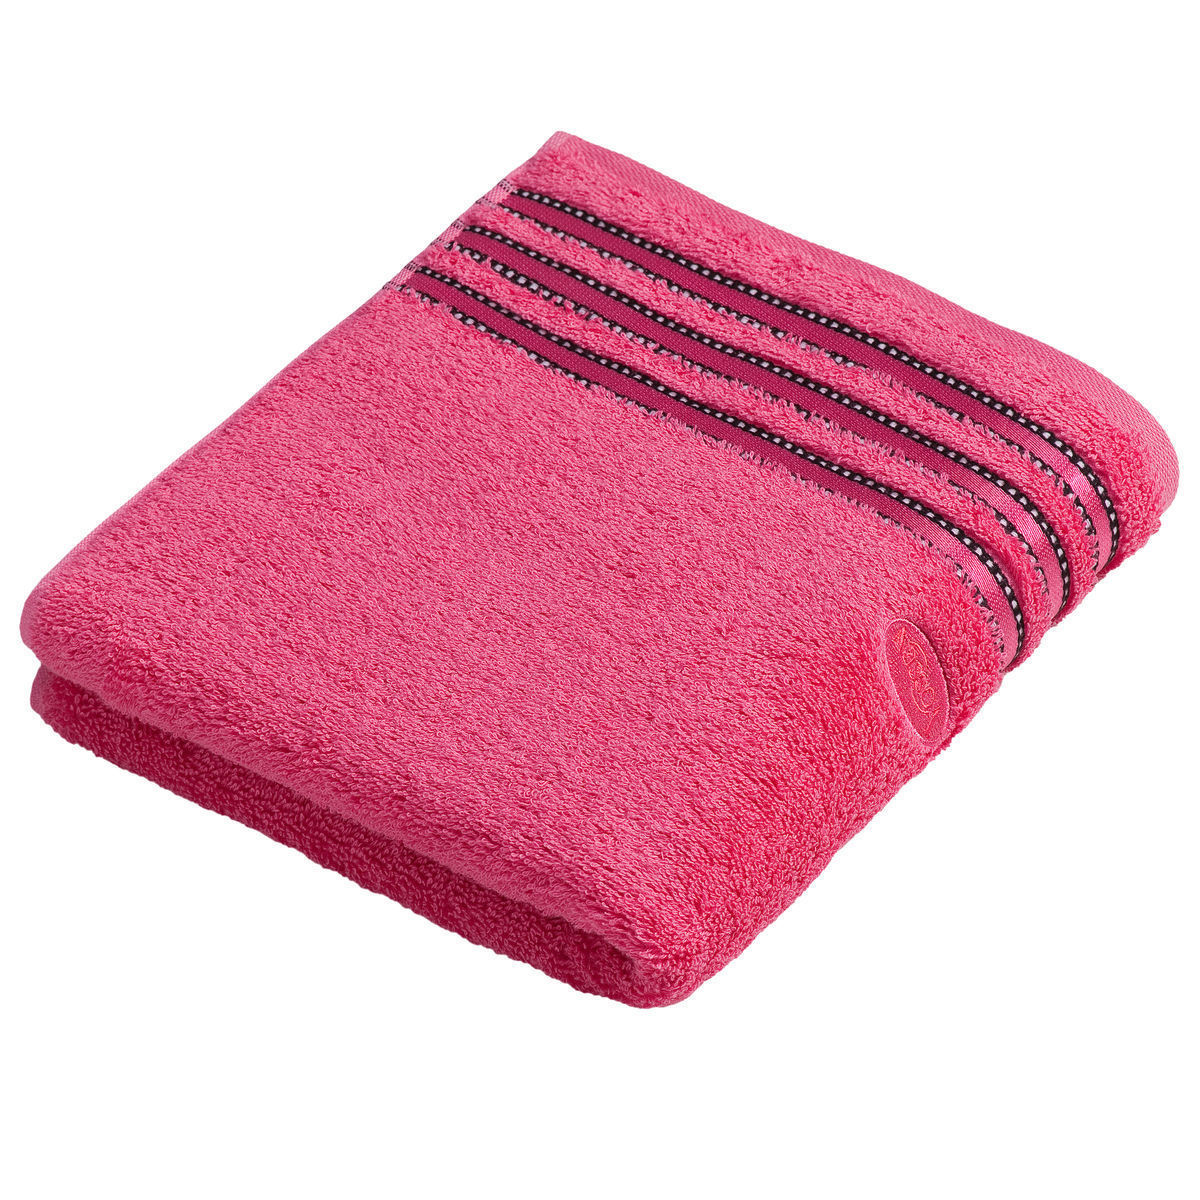 Полотенца Полотенце 100х150 Vossen Cult de Luxe rosy pink elitnoe-polotentse-cult-de-luxe-rosy-pink-ot-vossen-avstriya-50x100-1.jpg